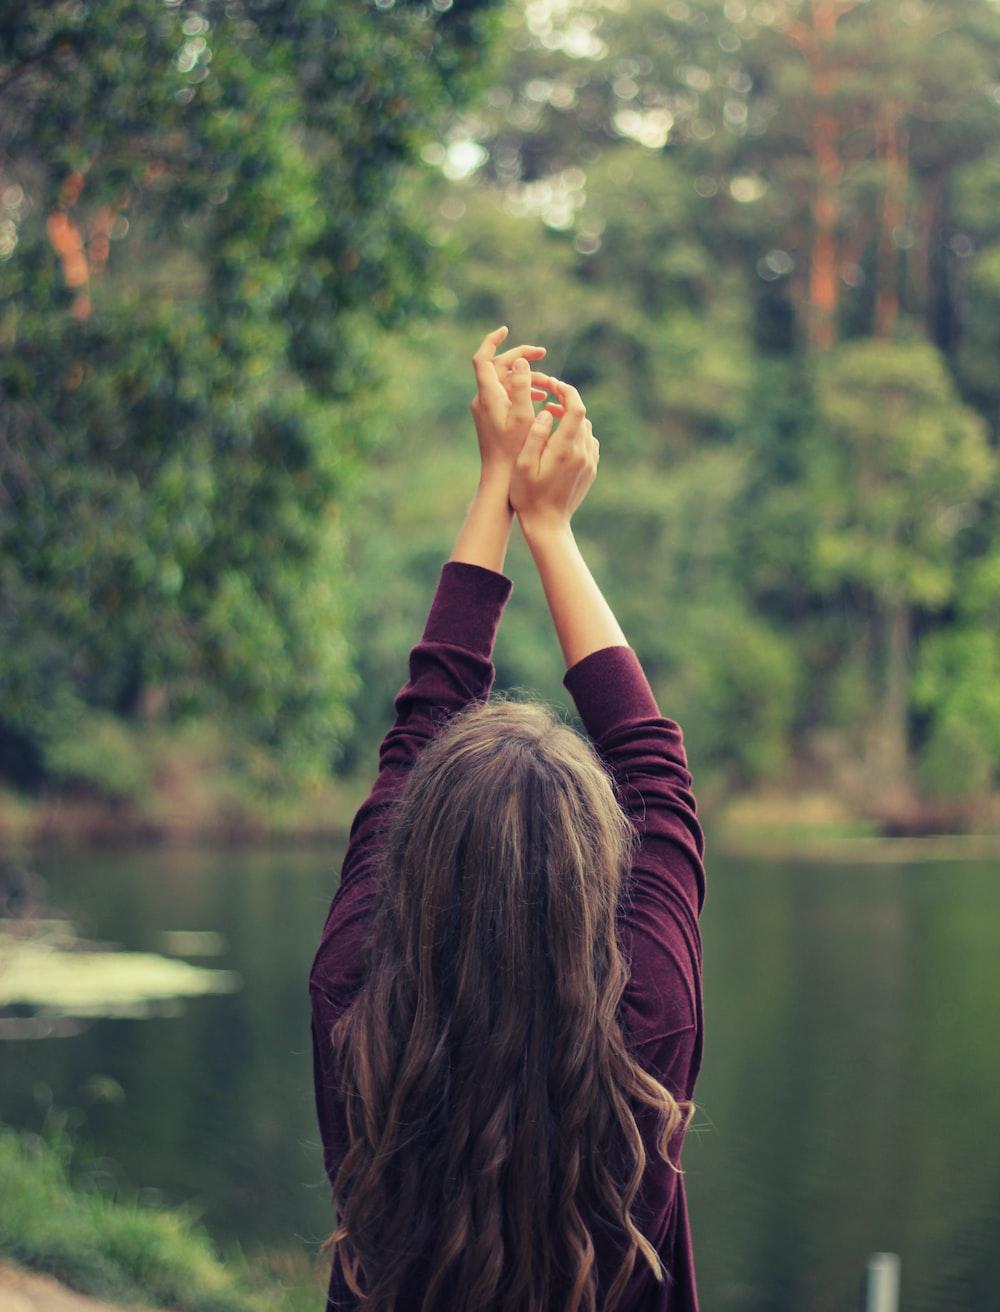 woman raising both of her hands